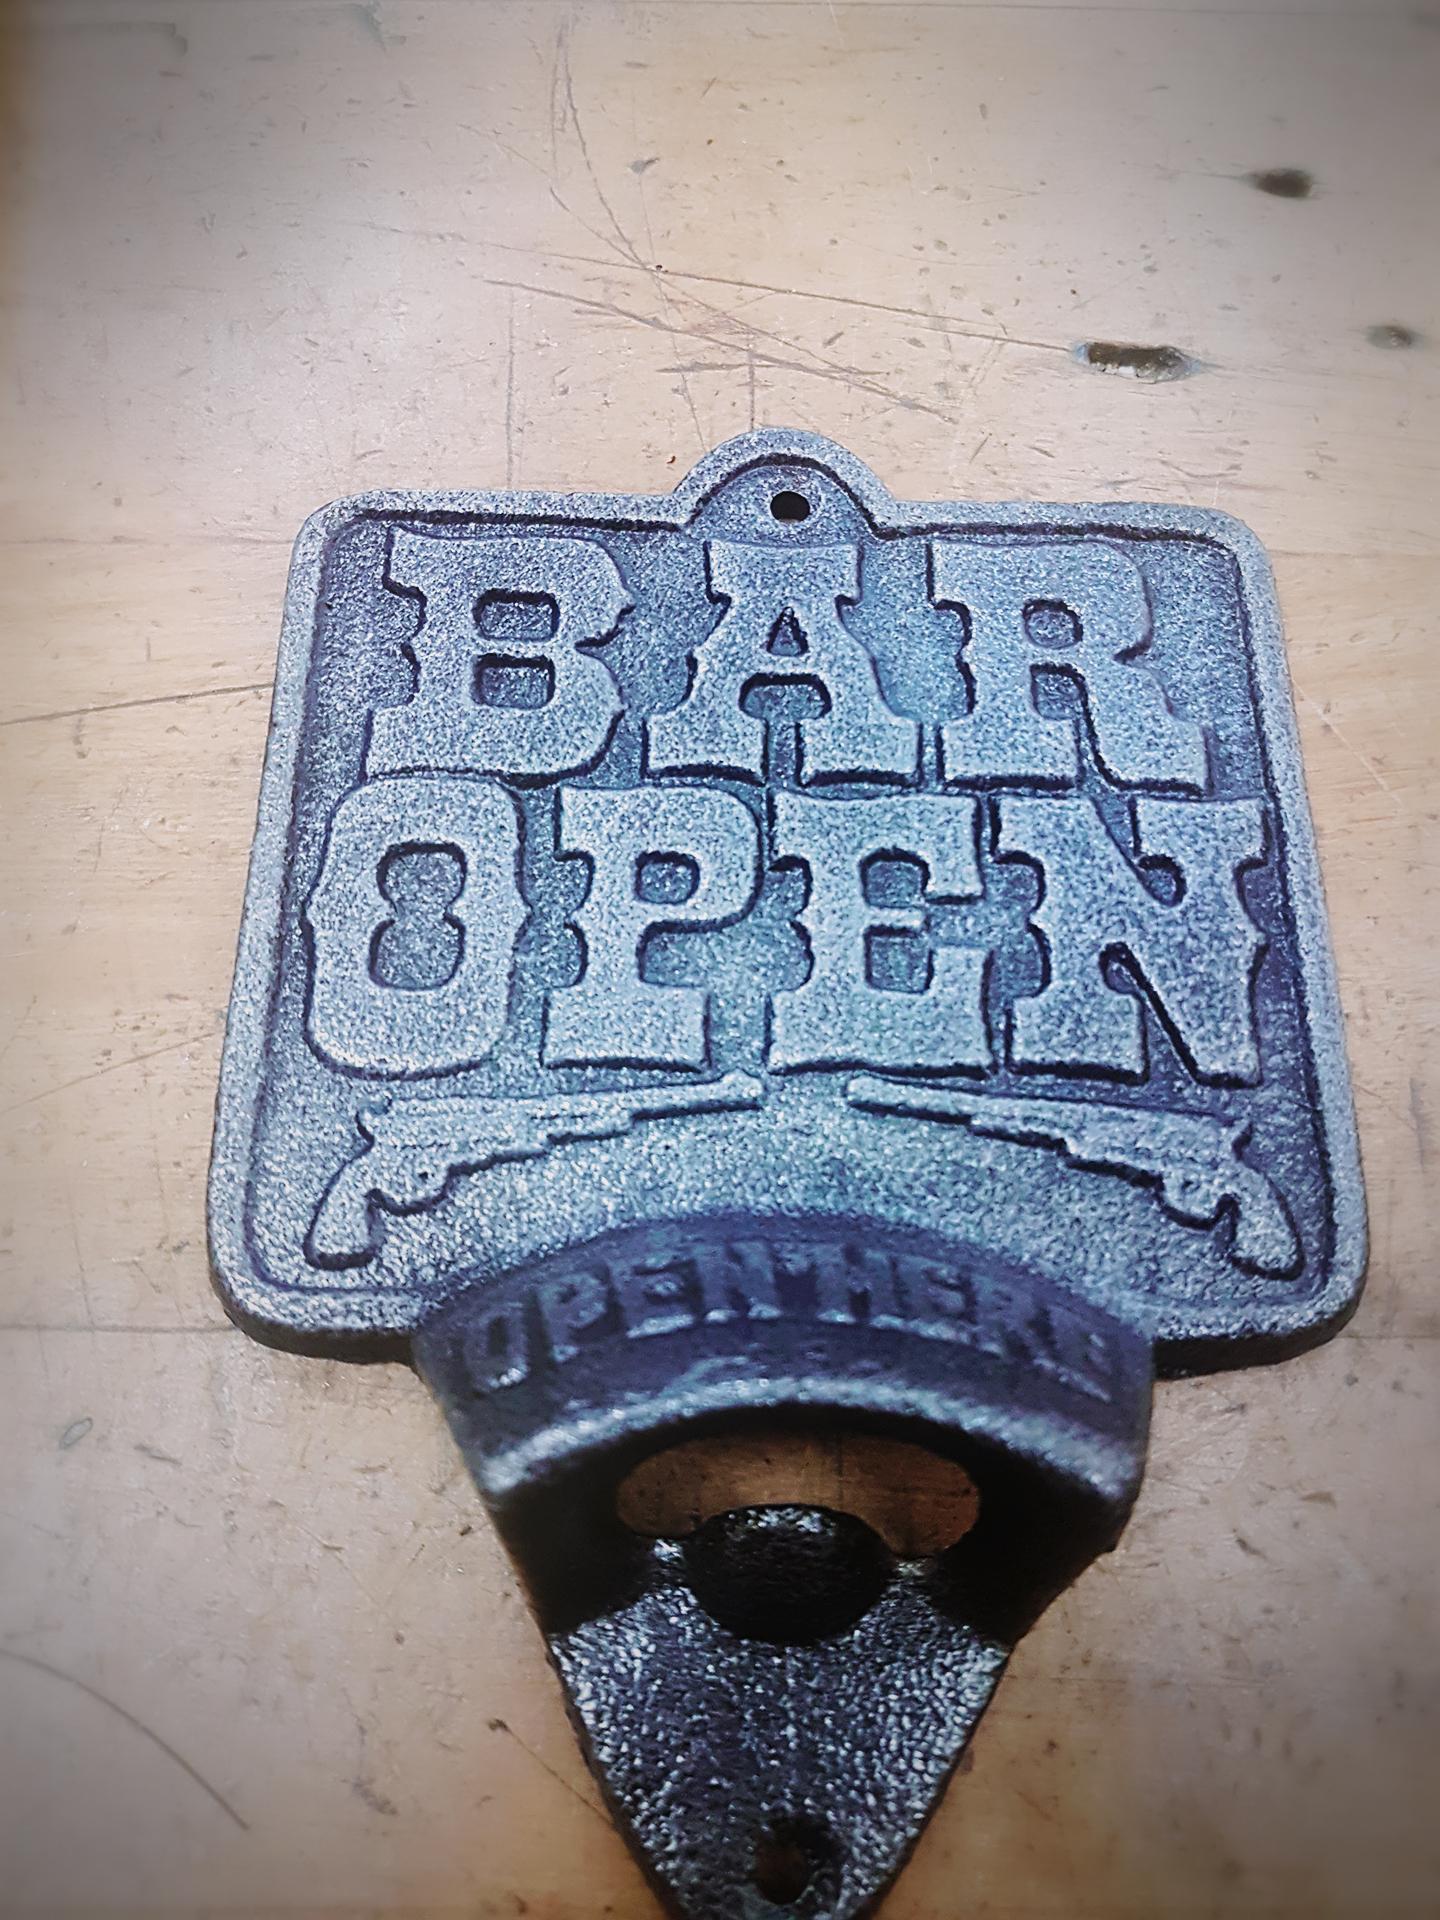 bar open bottle opener back country gifts christchurch new zealand. Black Bedroom Furniture Sets. Home Design Ideas